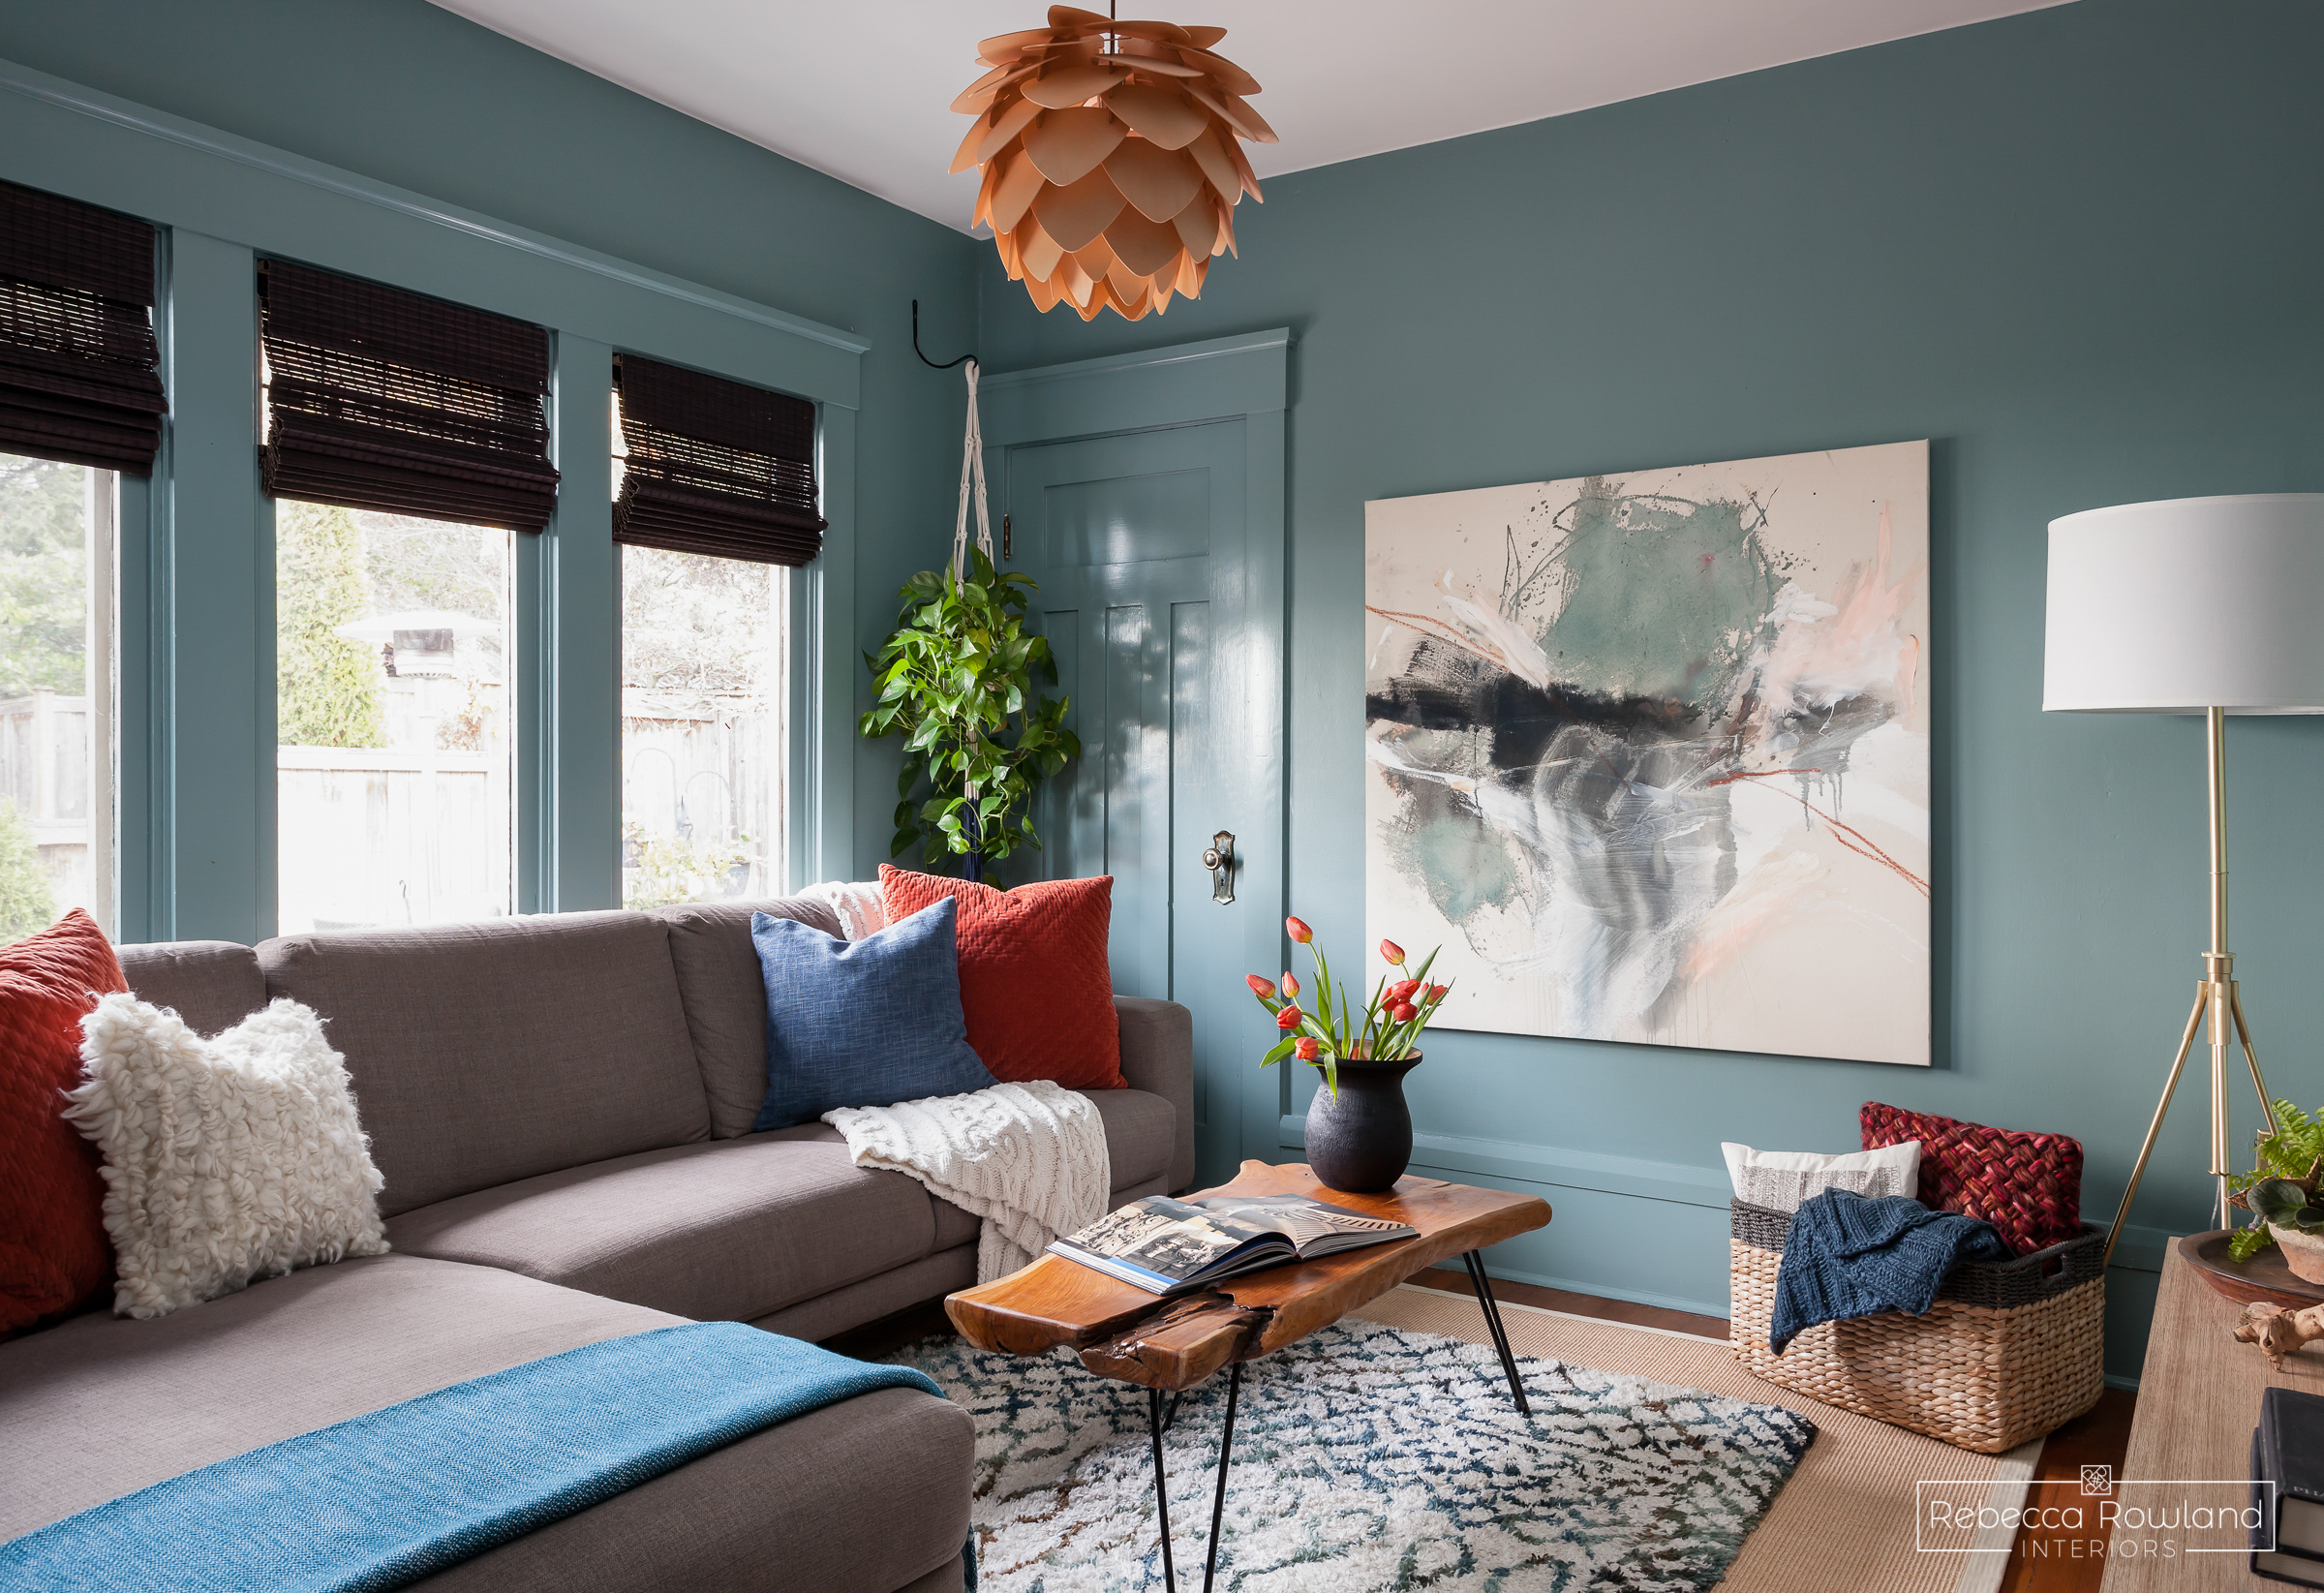 Rebecca Rowland Interiors _Roosevelt_Craftsman_seattle_interior_design_cozy_den_decor_styling_Behr_blue_grass_field_paint